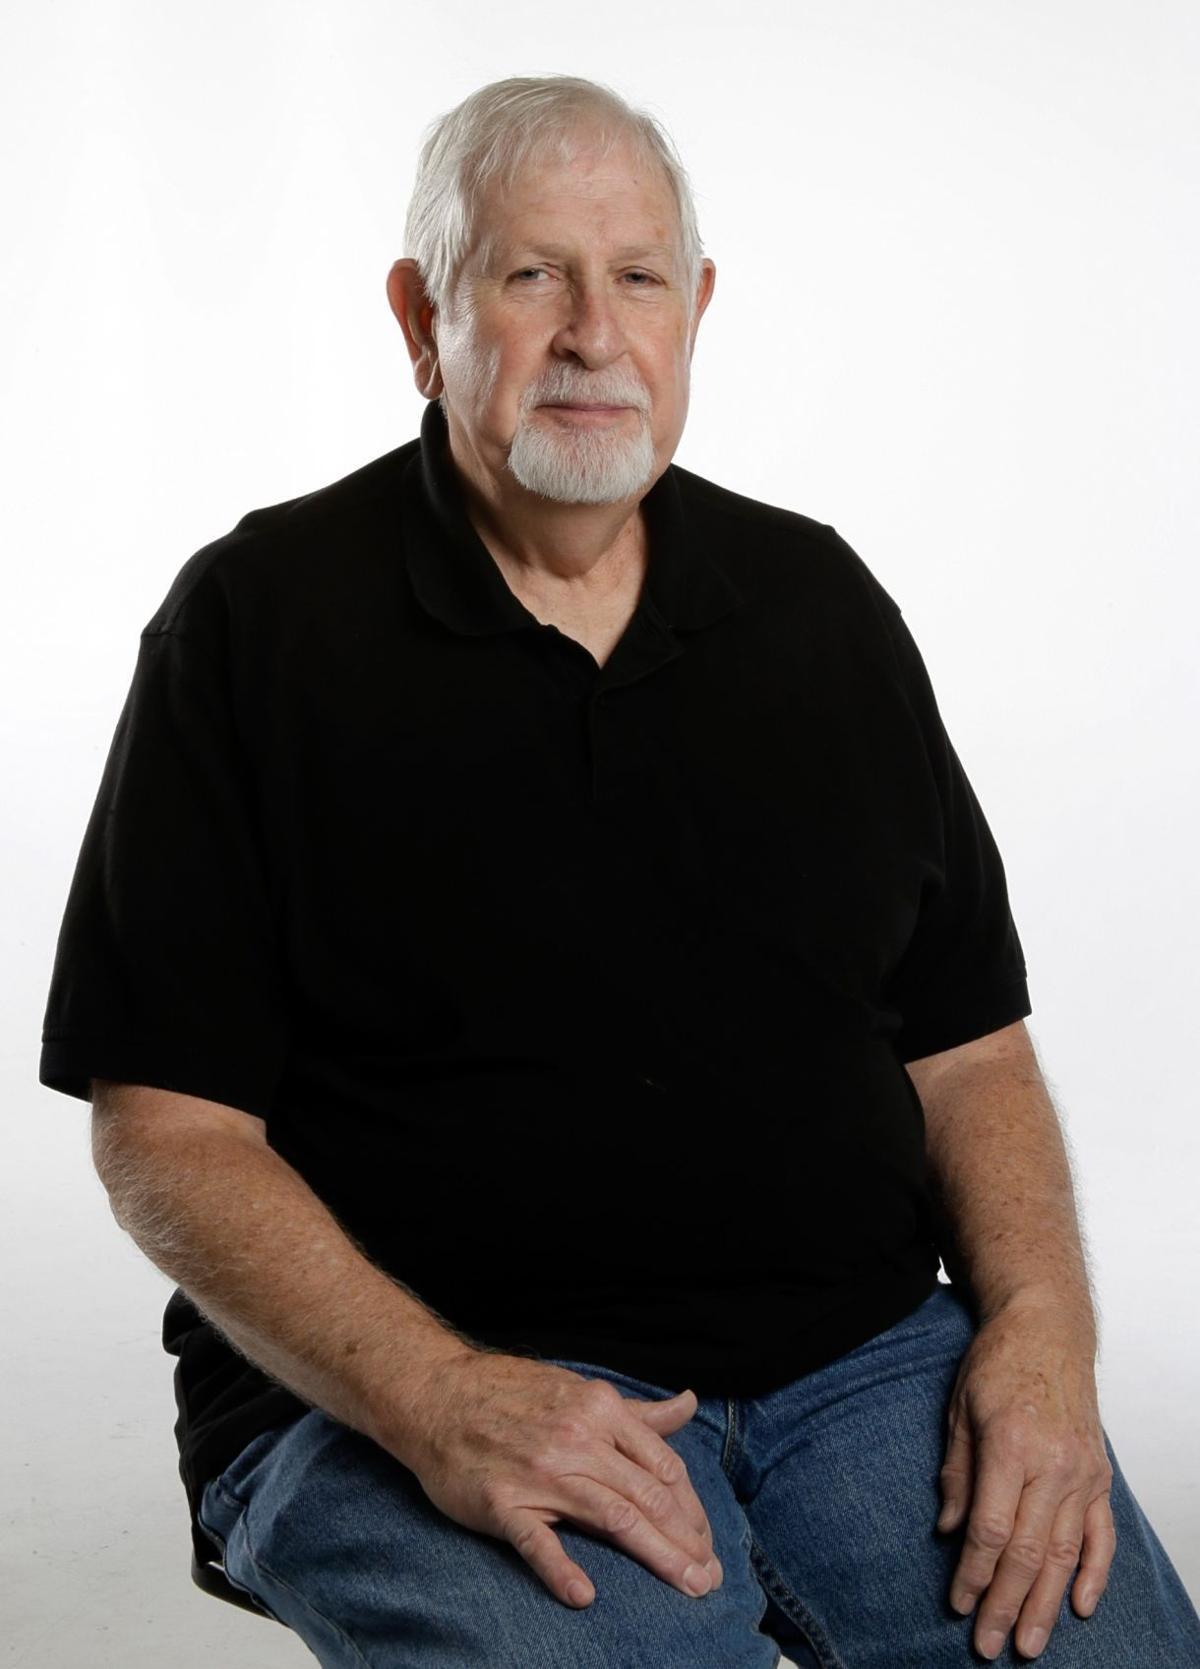 Vietnam veteran Dave Swoboda